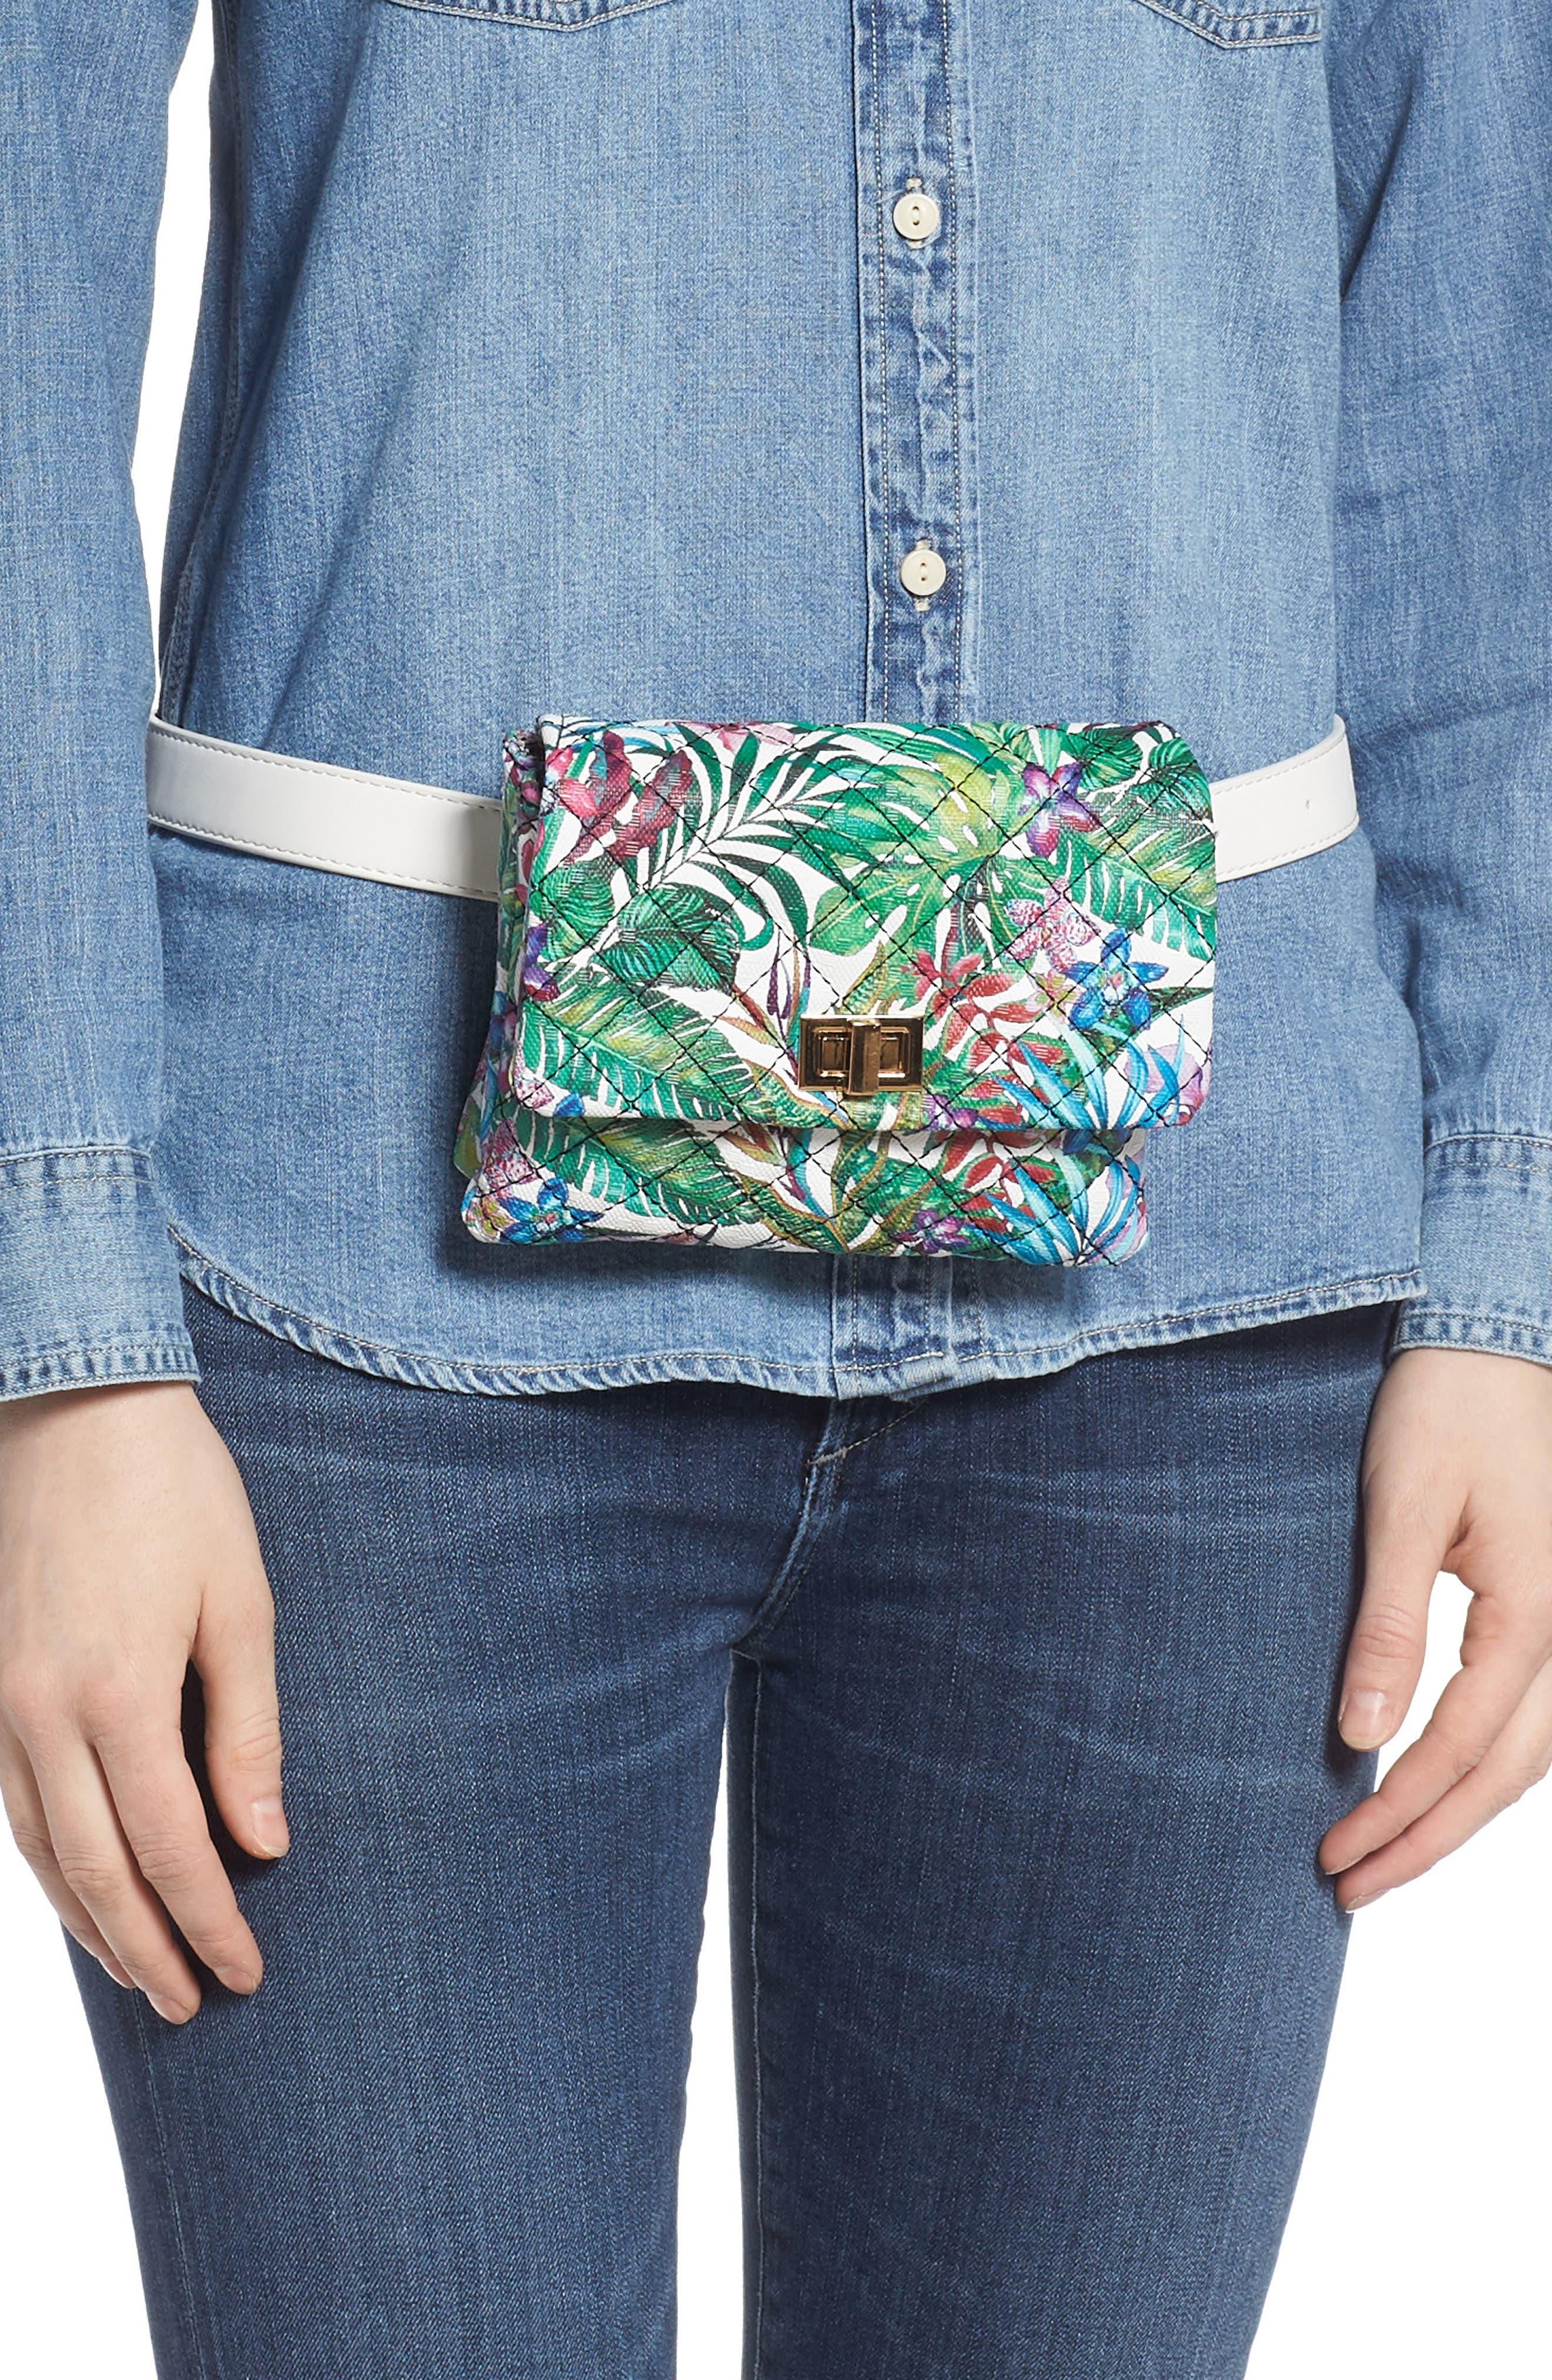 MALI + LILI,                             Quilted Vegan Leather Belt Bag,                             Alternate thumbnail 2, color,                             WHITE FLORAL